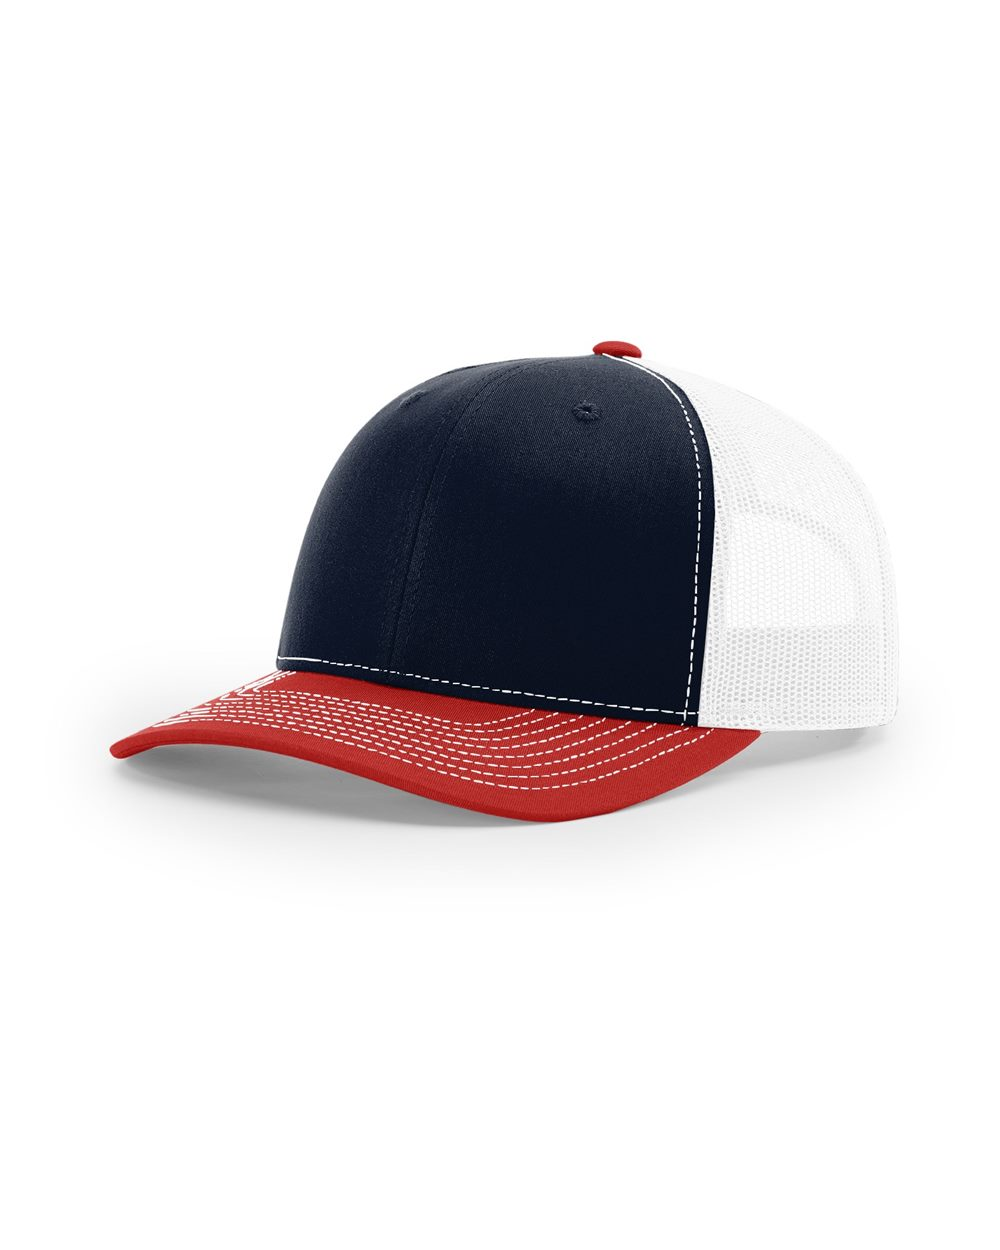 Navy/ White/ Red